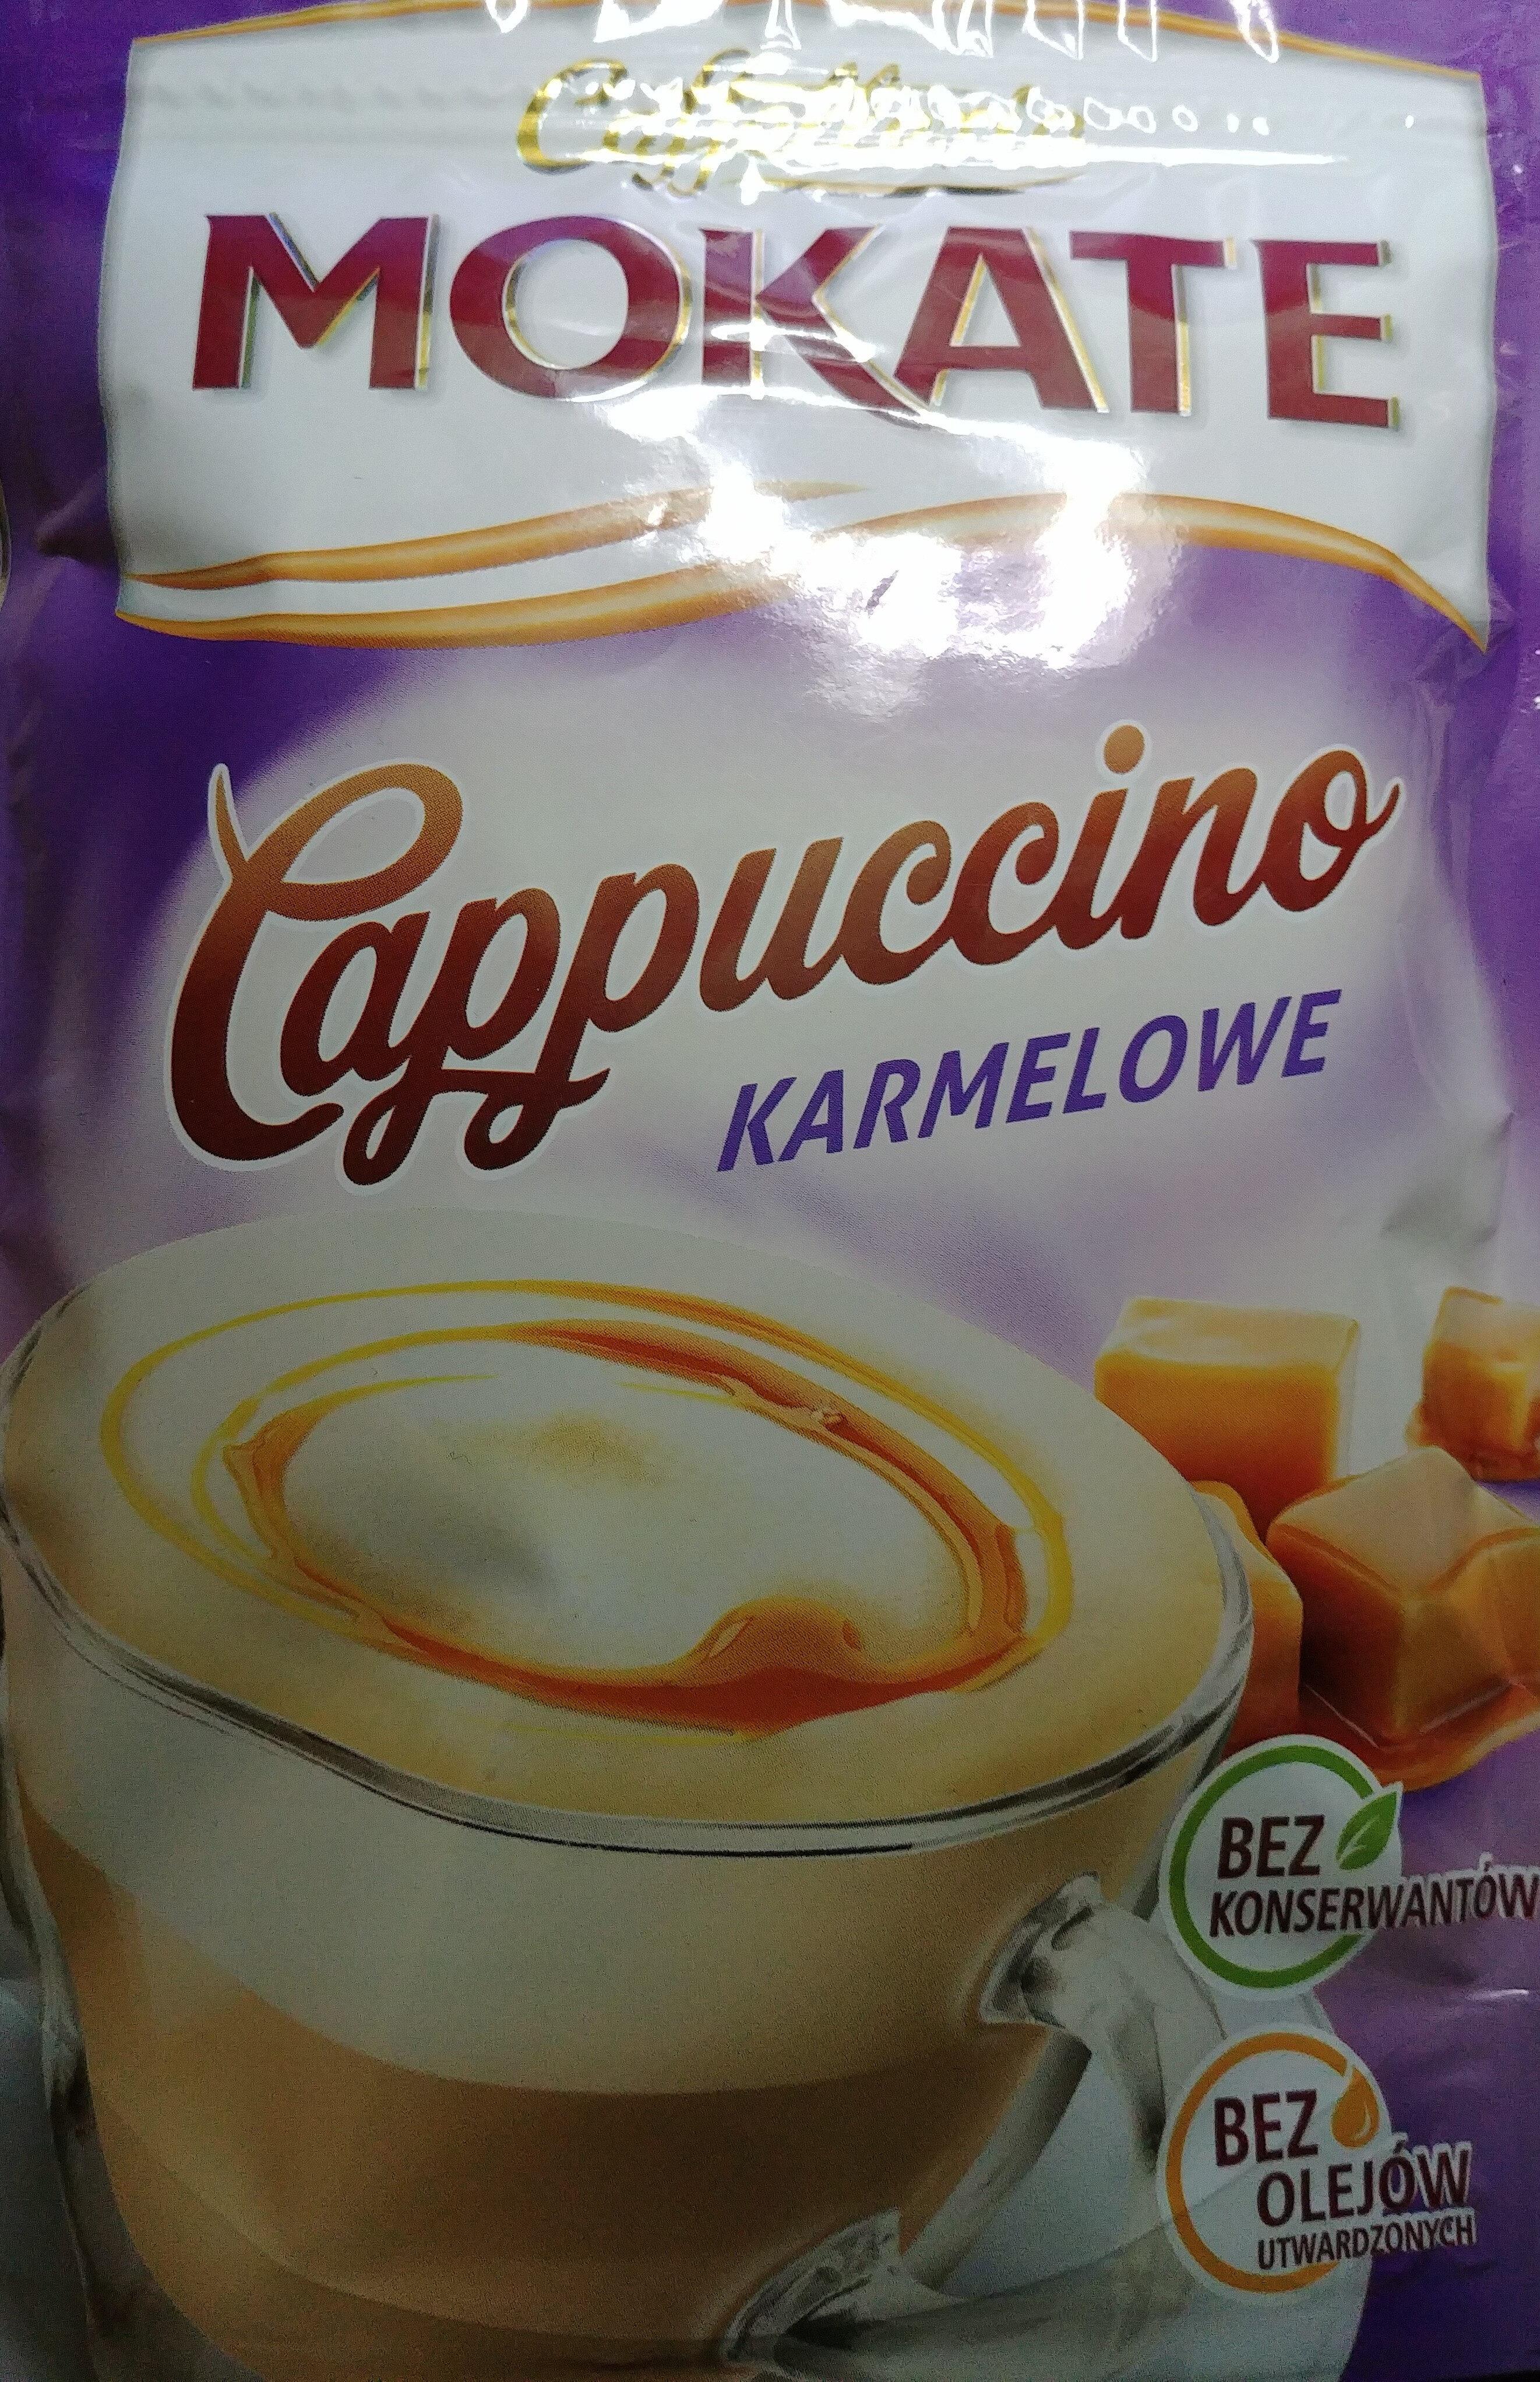 Cappuccino karmelowe - Produkt